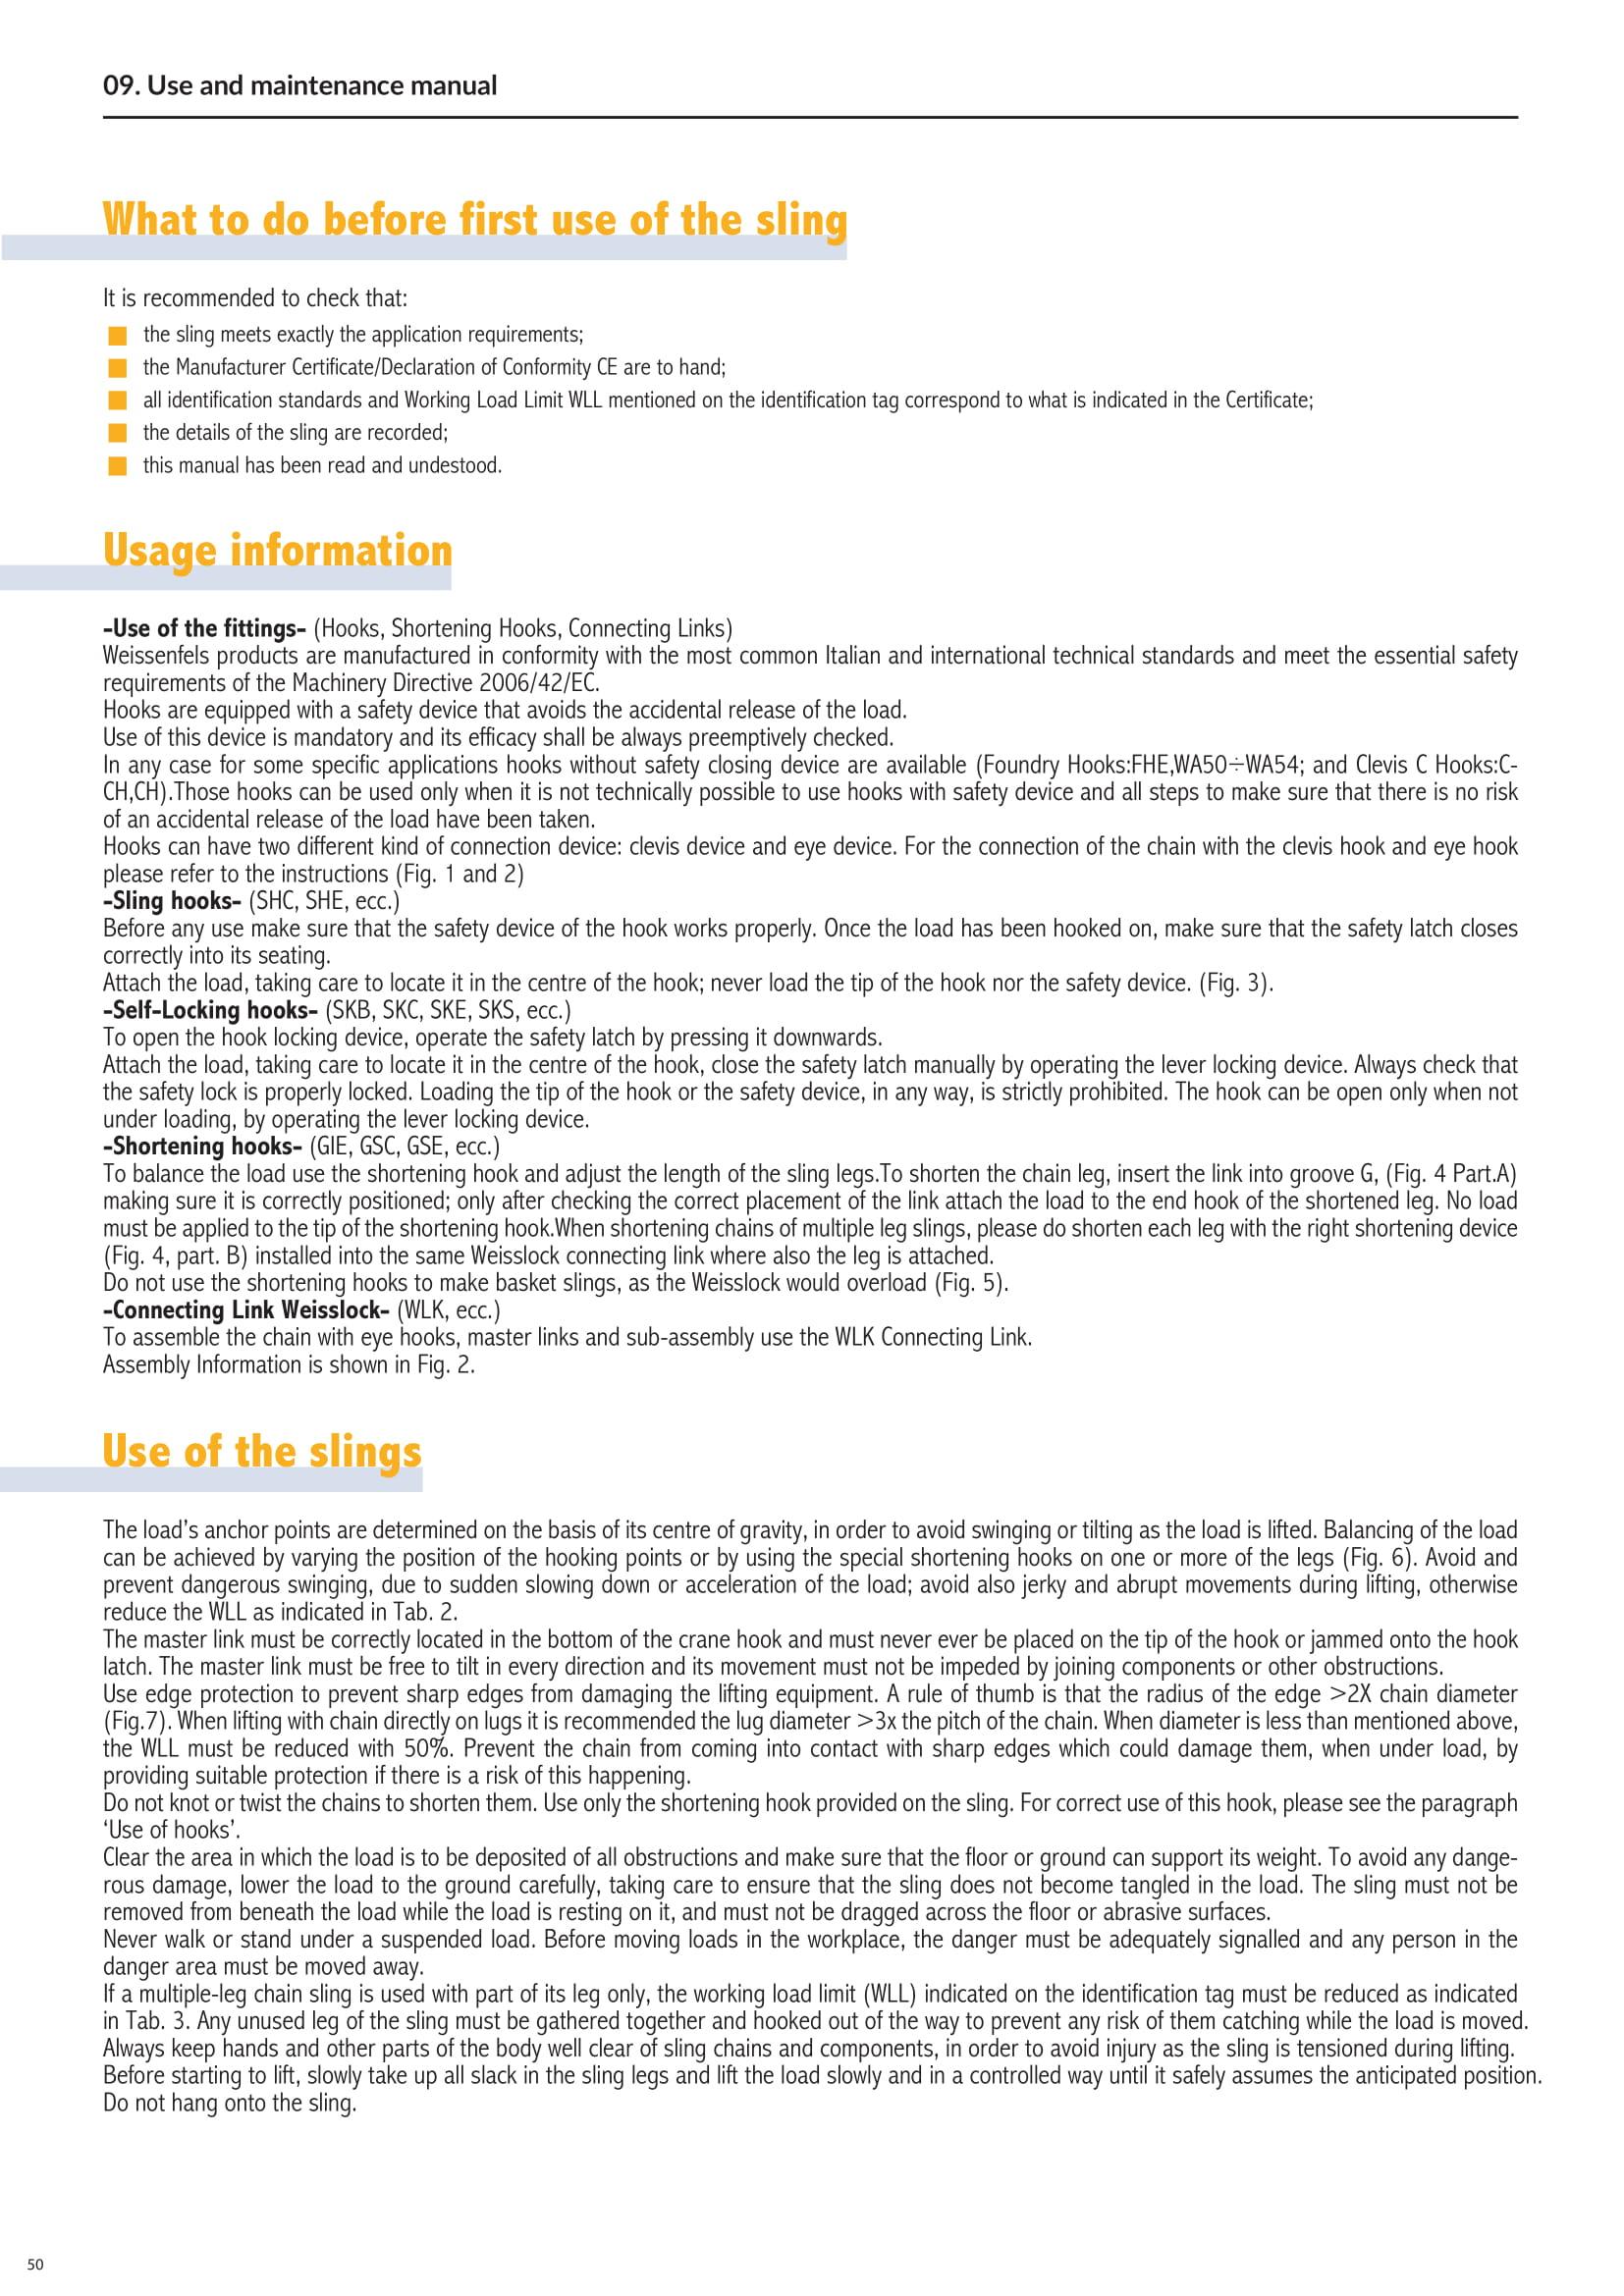 Kito-Weissenfels-manual-ed6-en-3